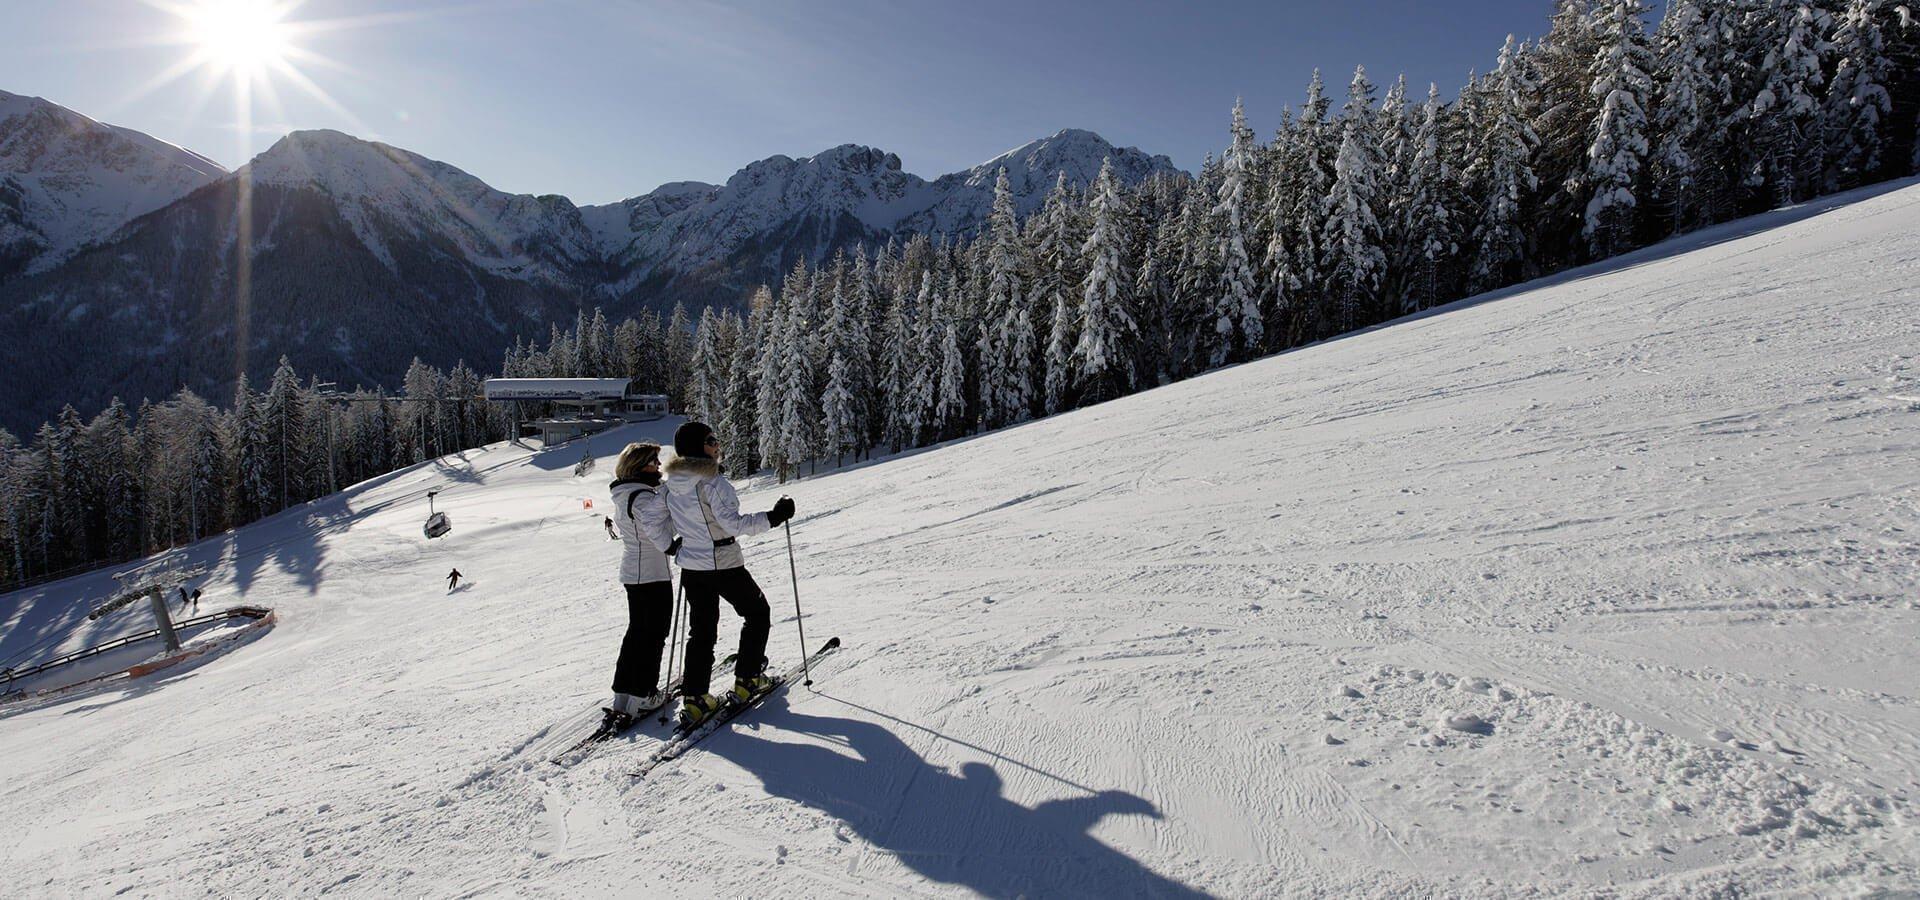 Skiurlaub Kronplatz - Fuchshof im Pustertal